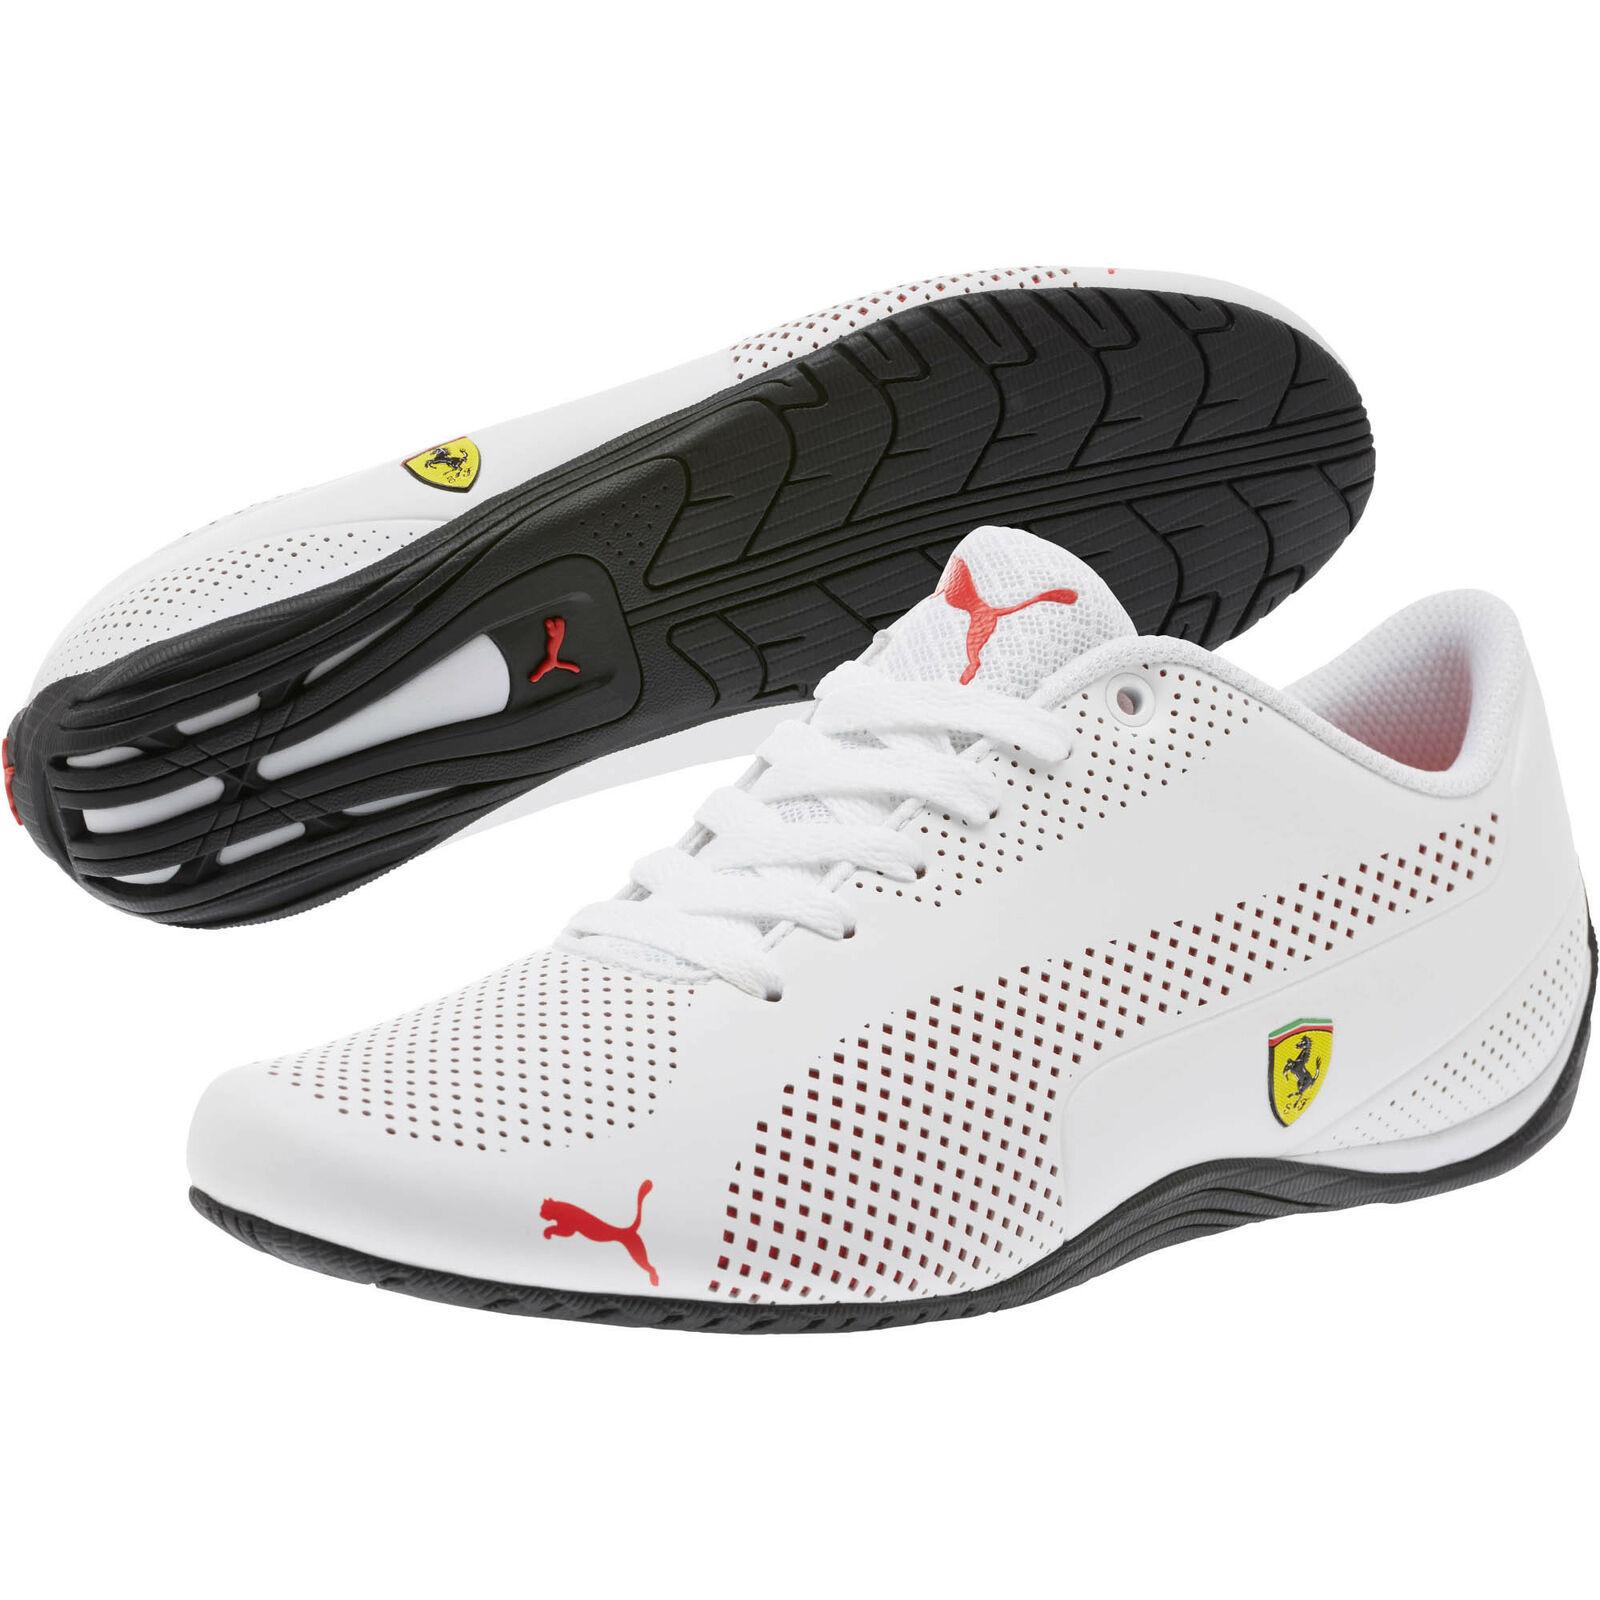 PUMA Scuderia Ferrari Drift Cat 5 Ultra shoes Men shoes Auto